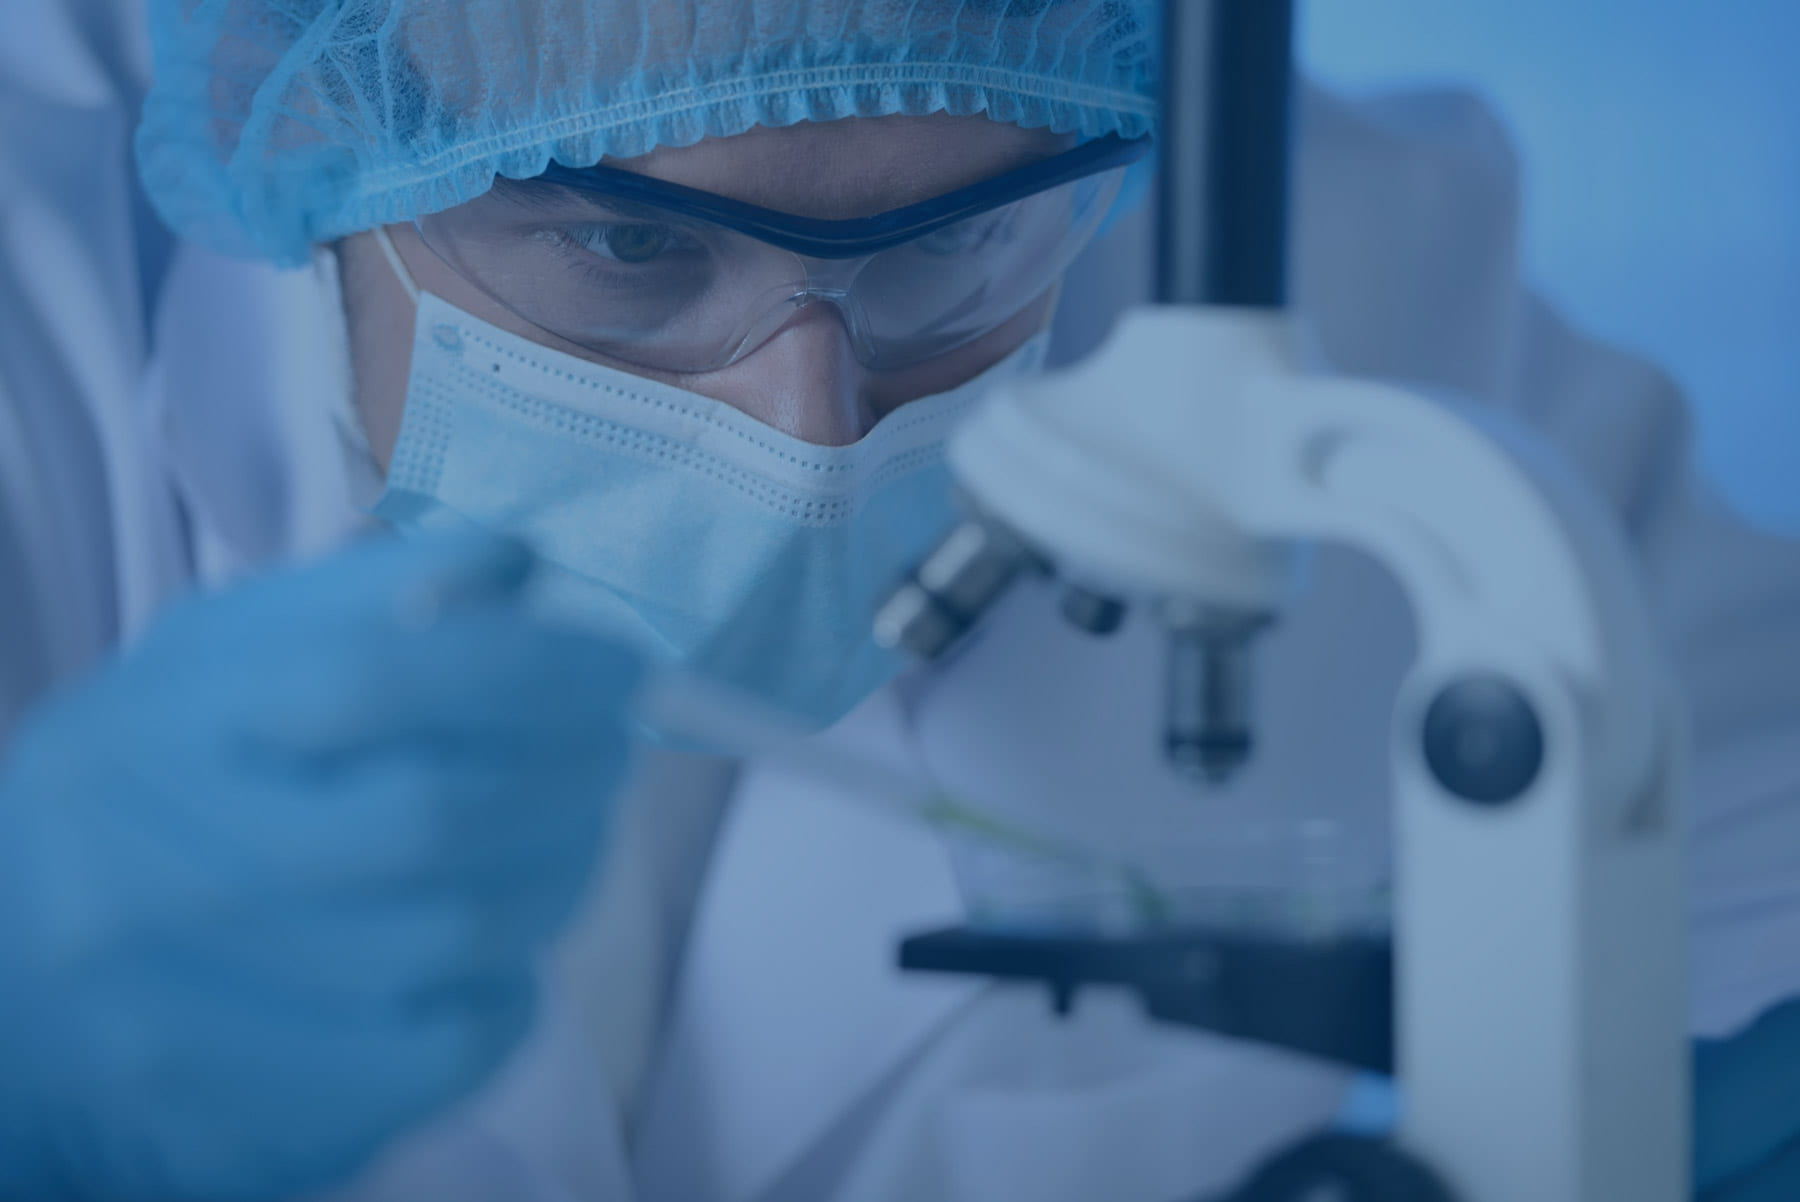 Testing & Calibration Laboratories Accreditation ISO/IEC 17025